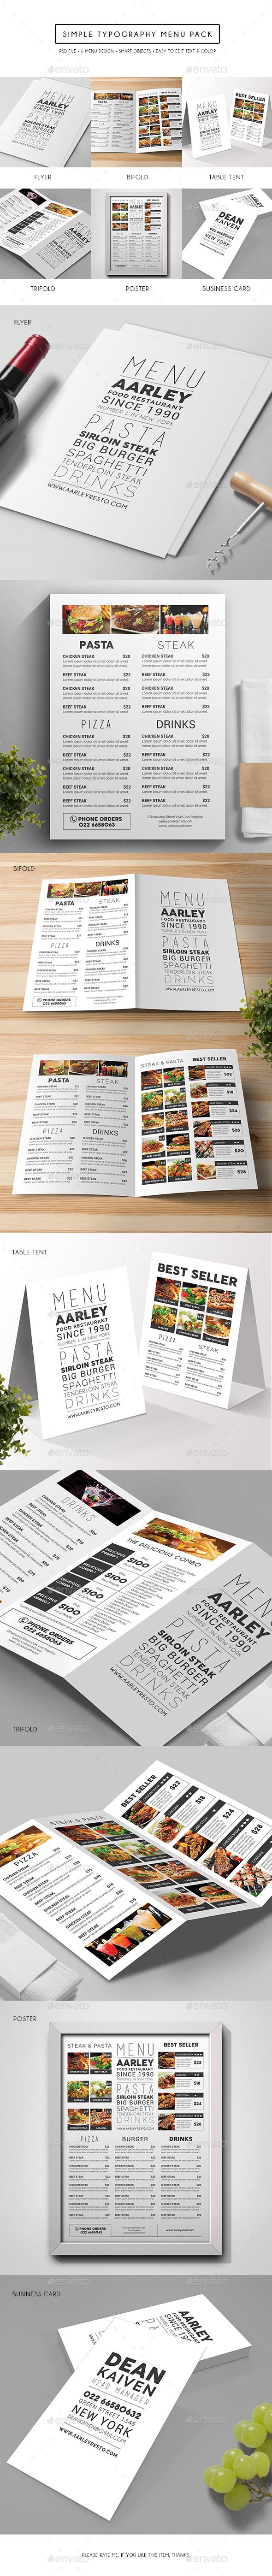 Simple Typography Menu Pack - Food Menus Print Templates